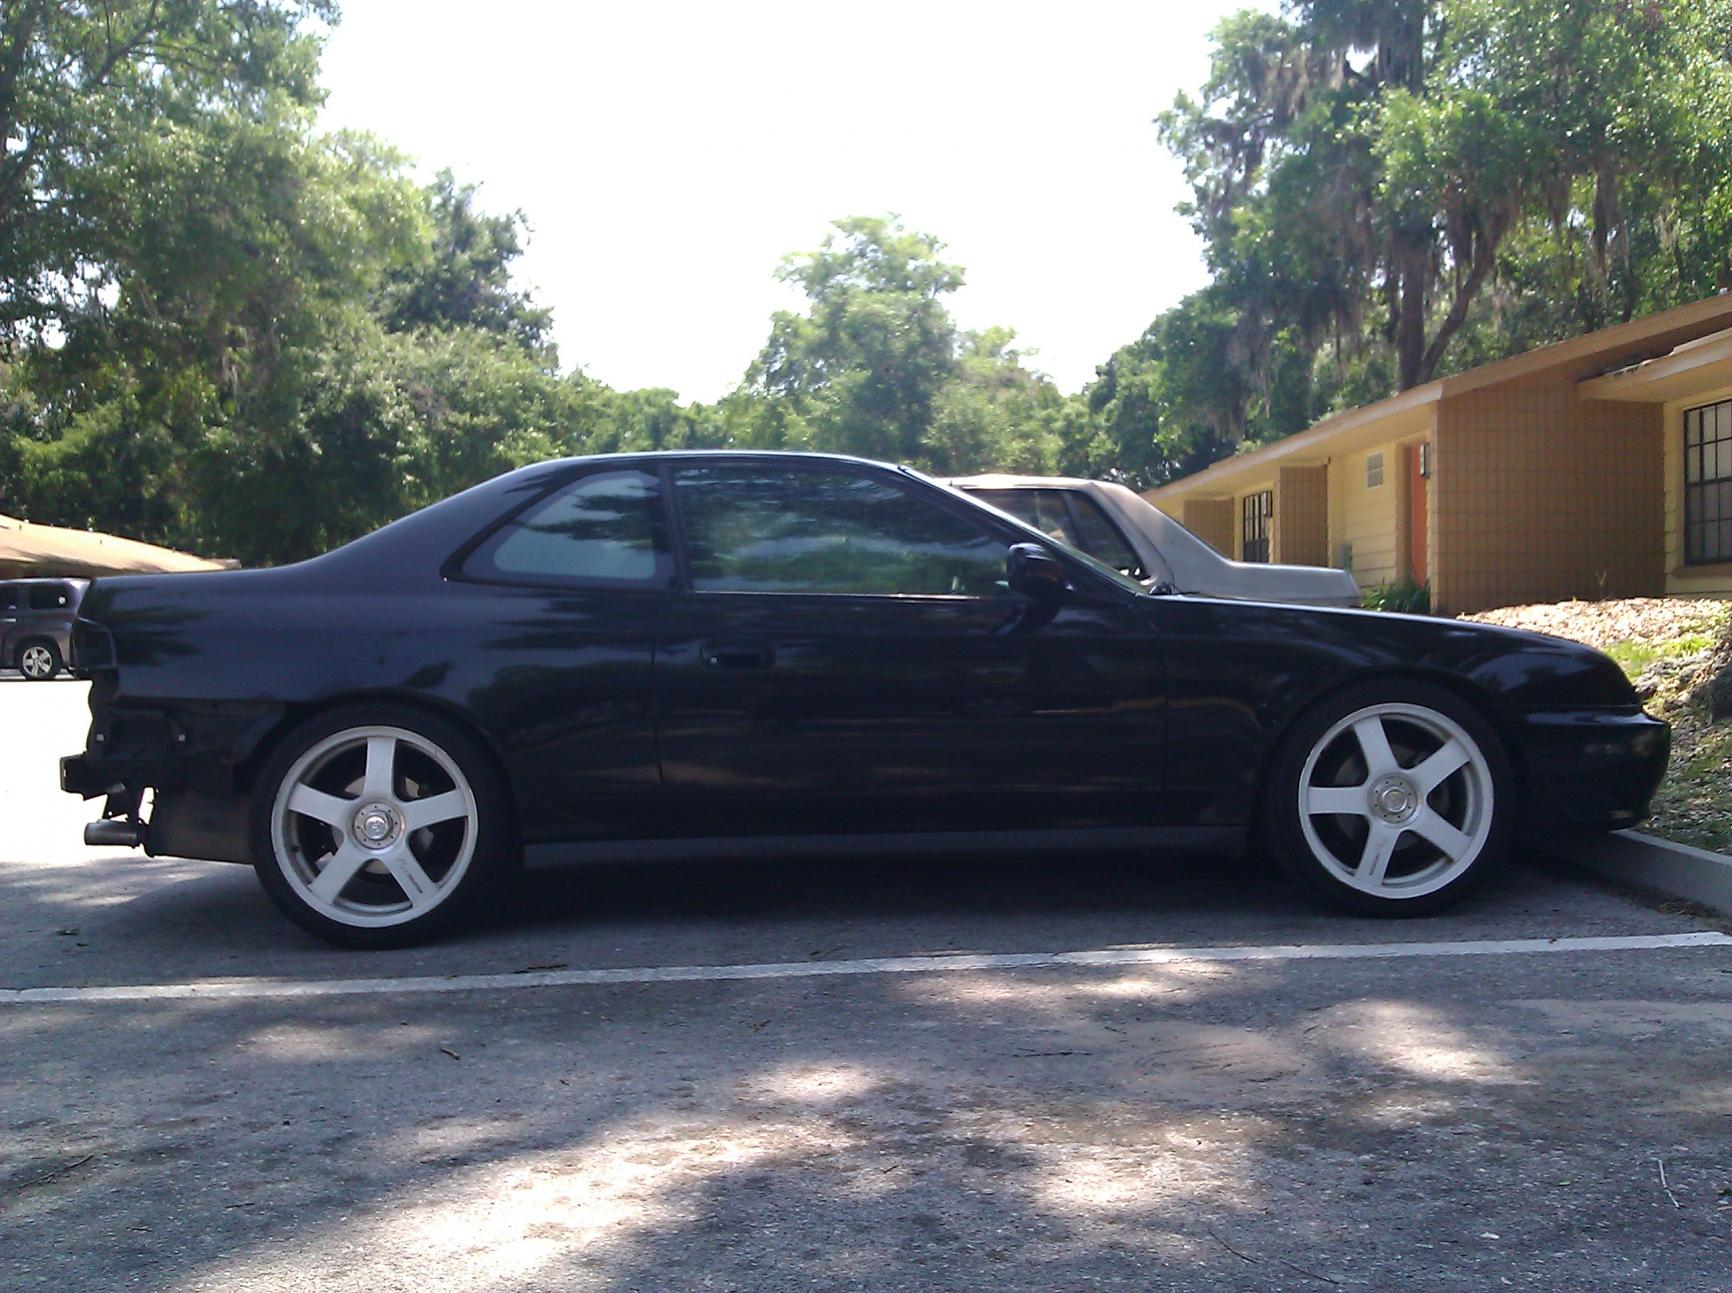 F5 Black with RH white C5's - Honda Prelude Forum